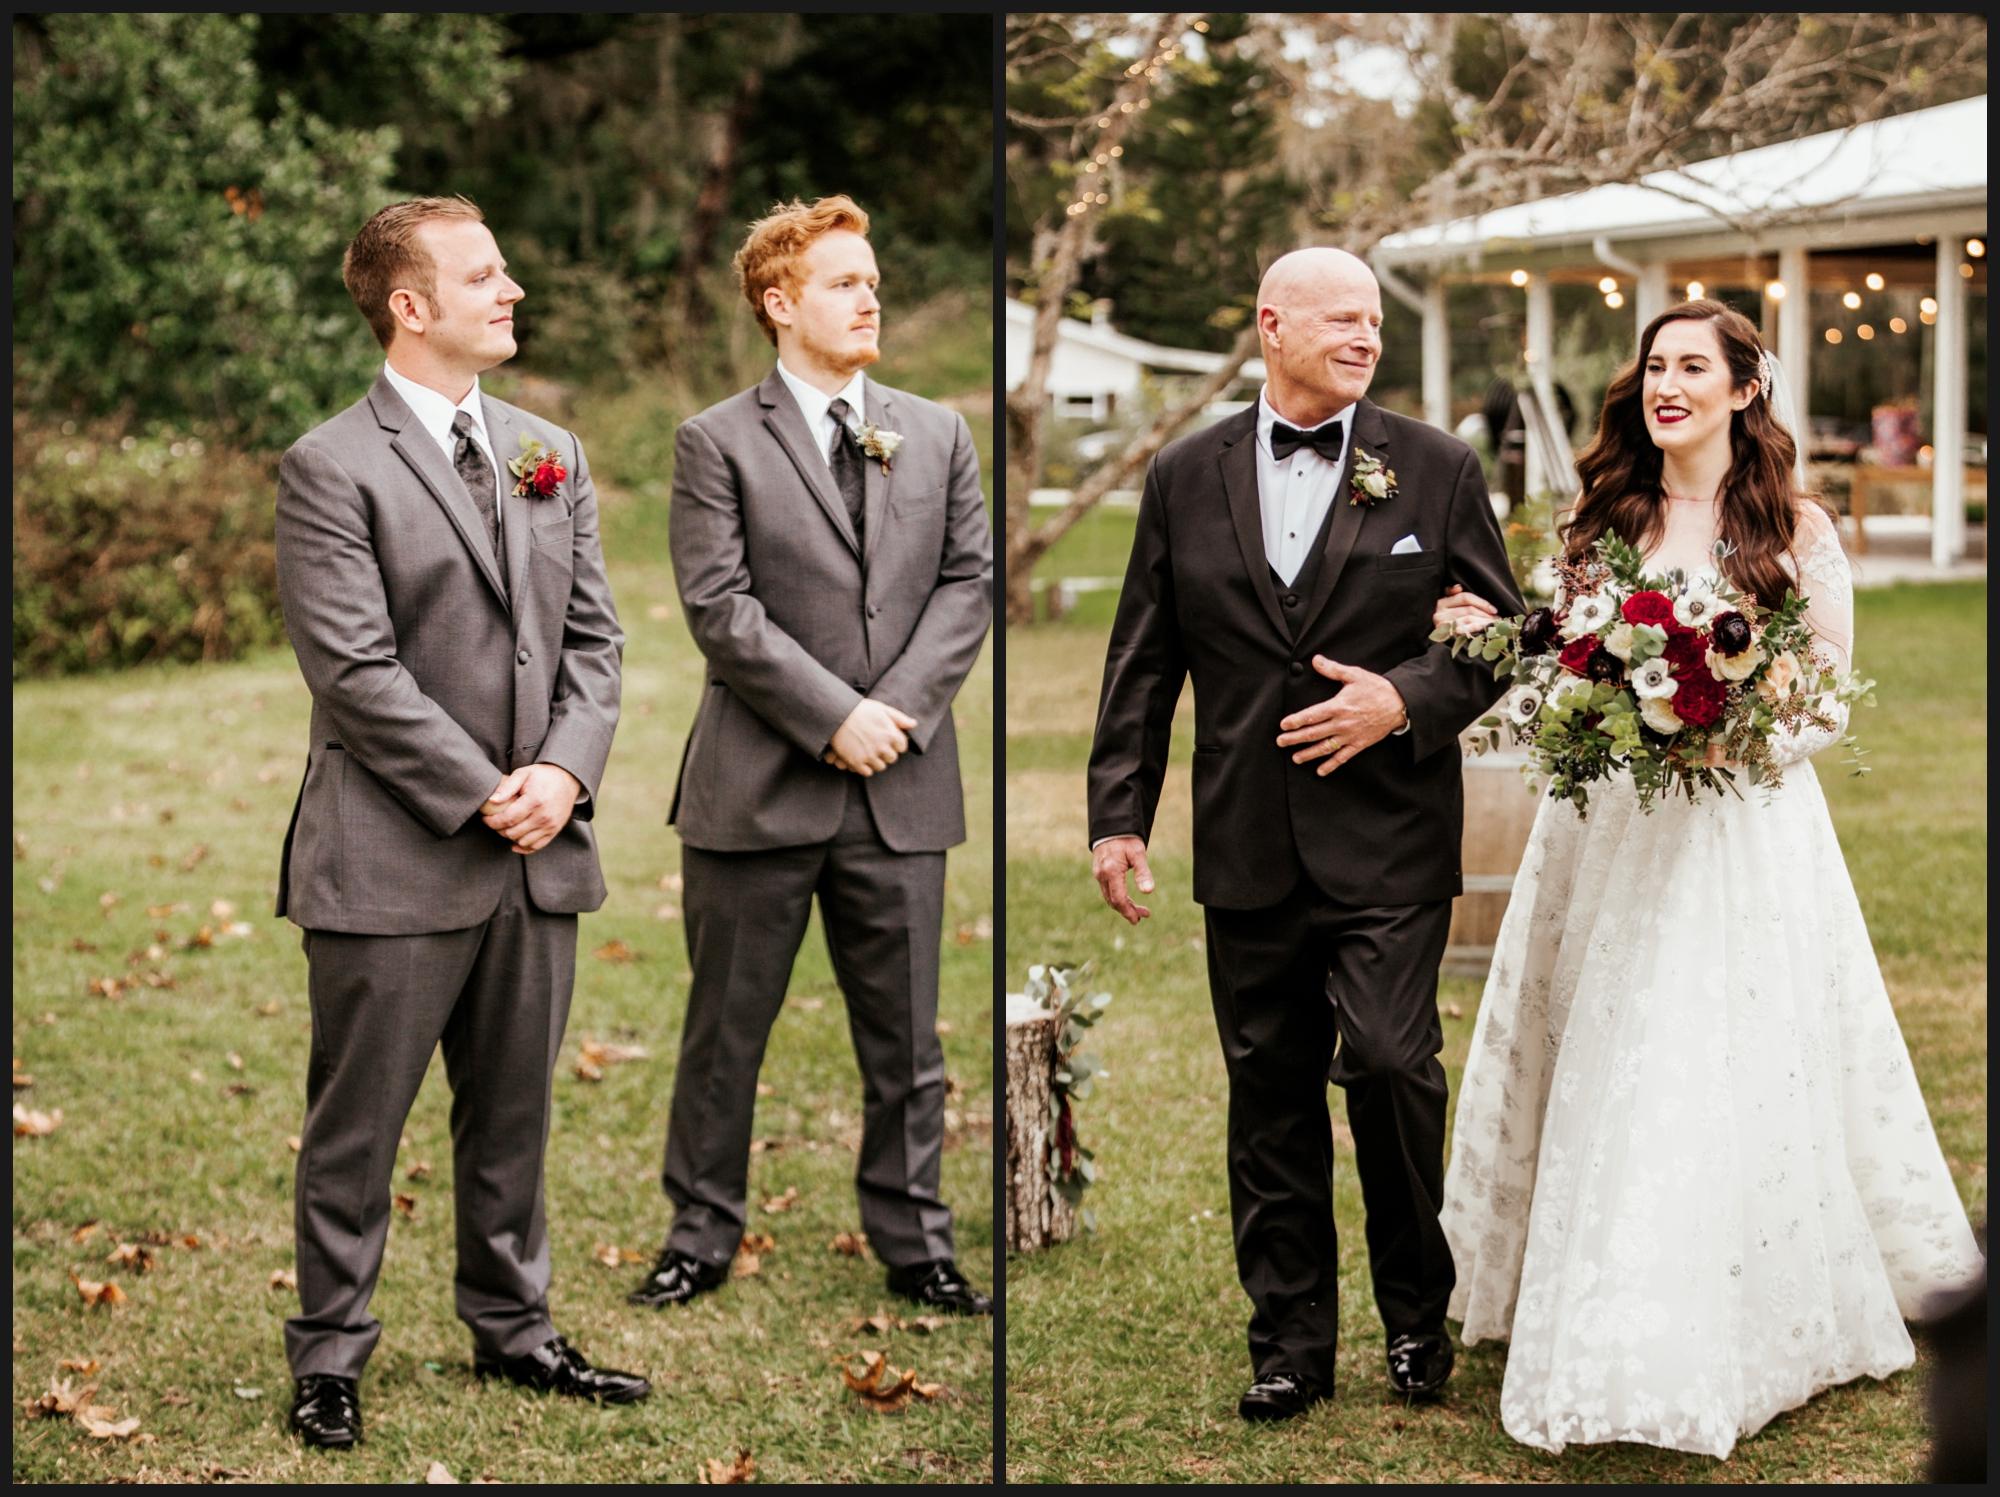 Orlando-Wedding-Photographer-destination-wedding-photographer-florida-wedding-photographer-hawaii-wedding-photographer_0478.jpg